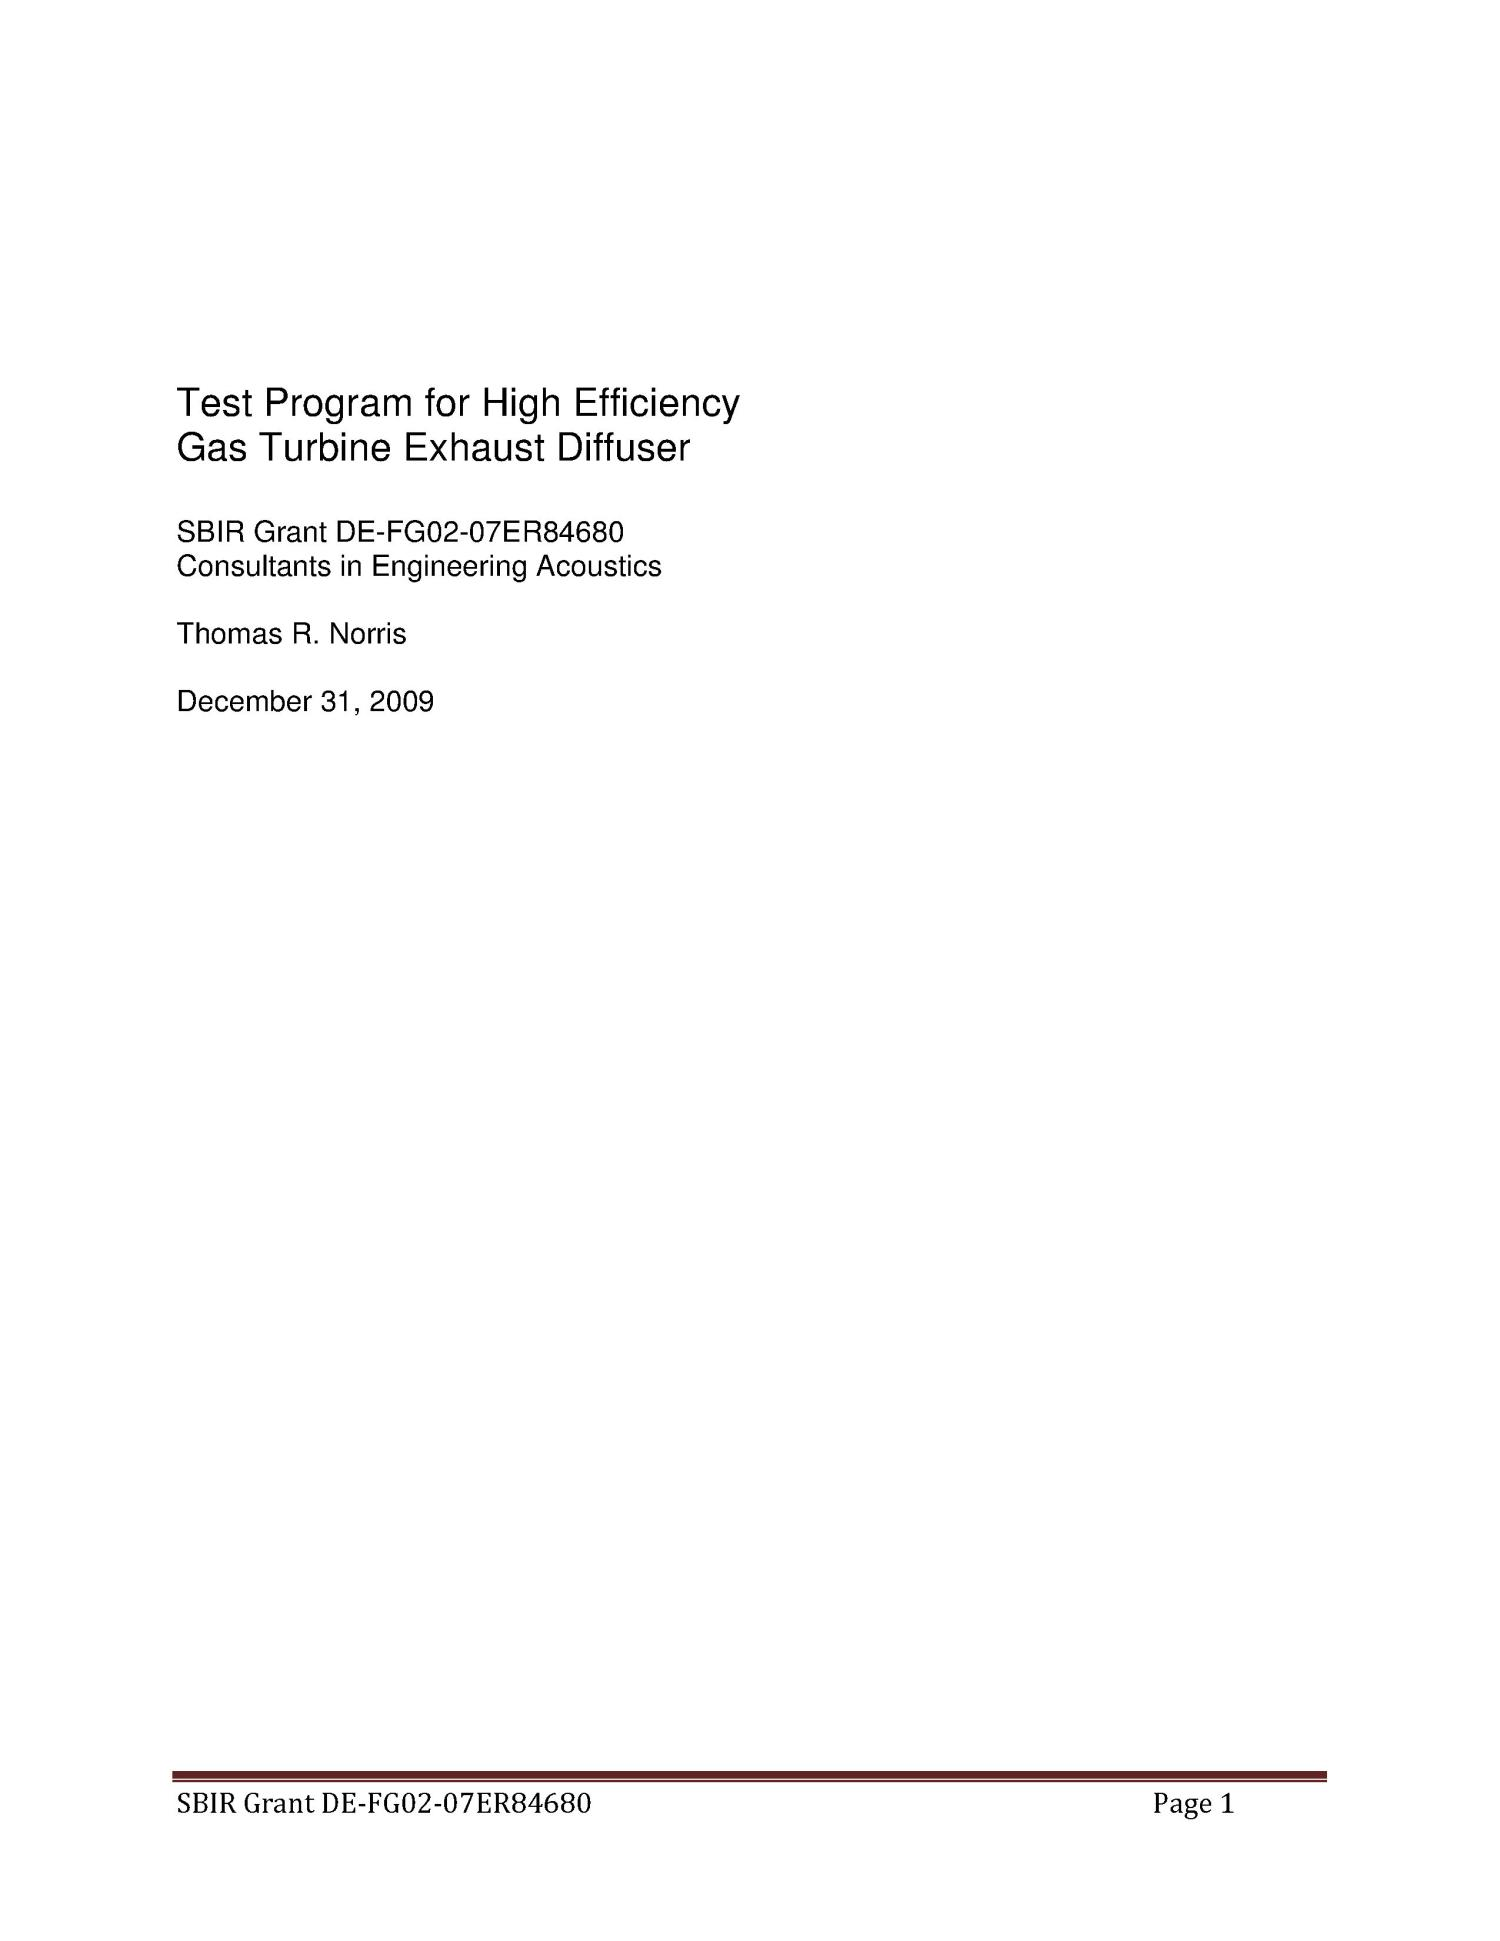 Test Program for High Efficiency Gas Turbine Exhaust Diffuser